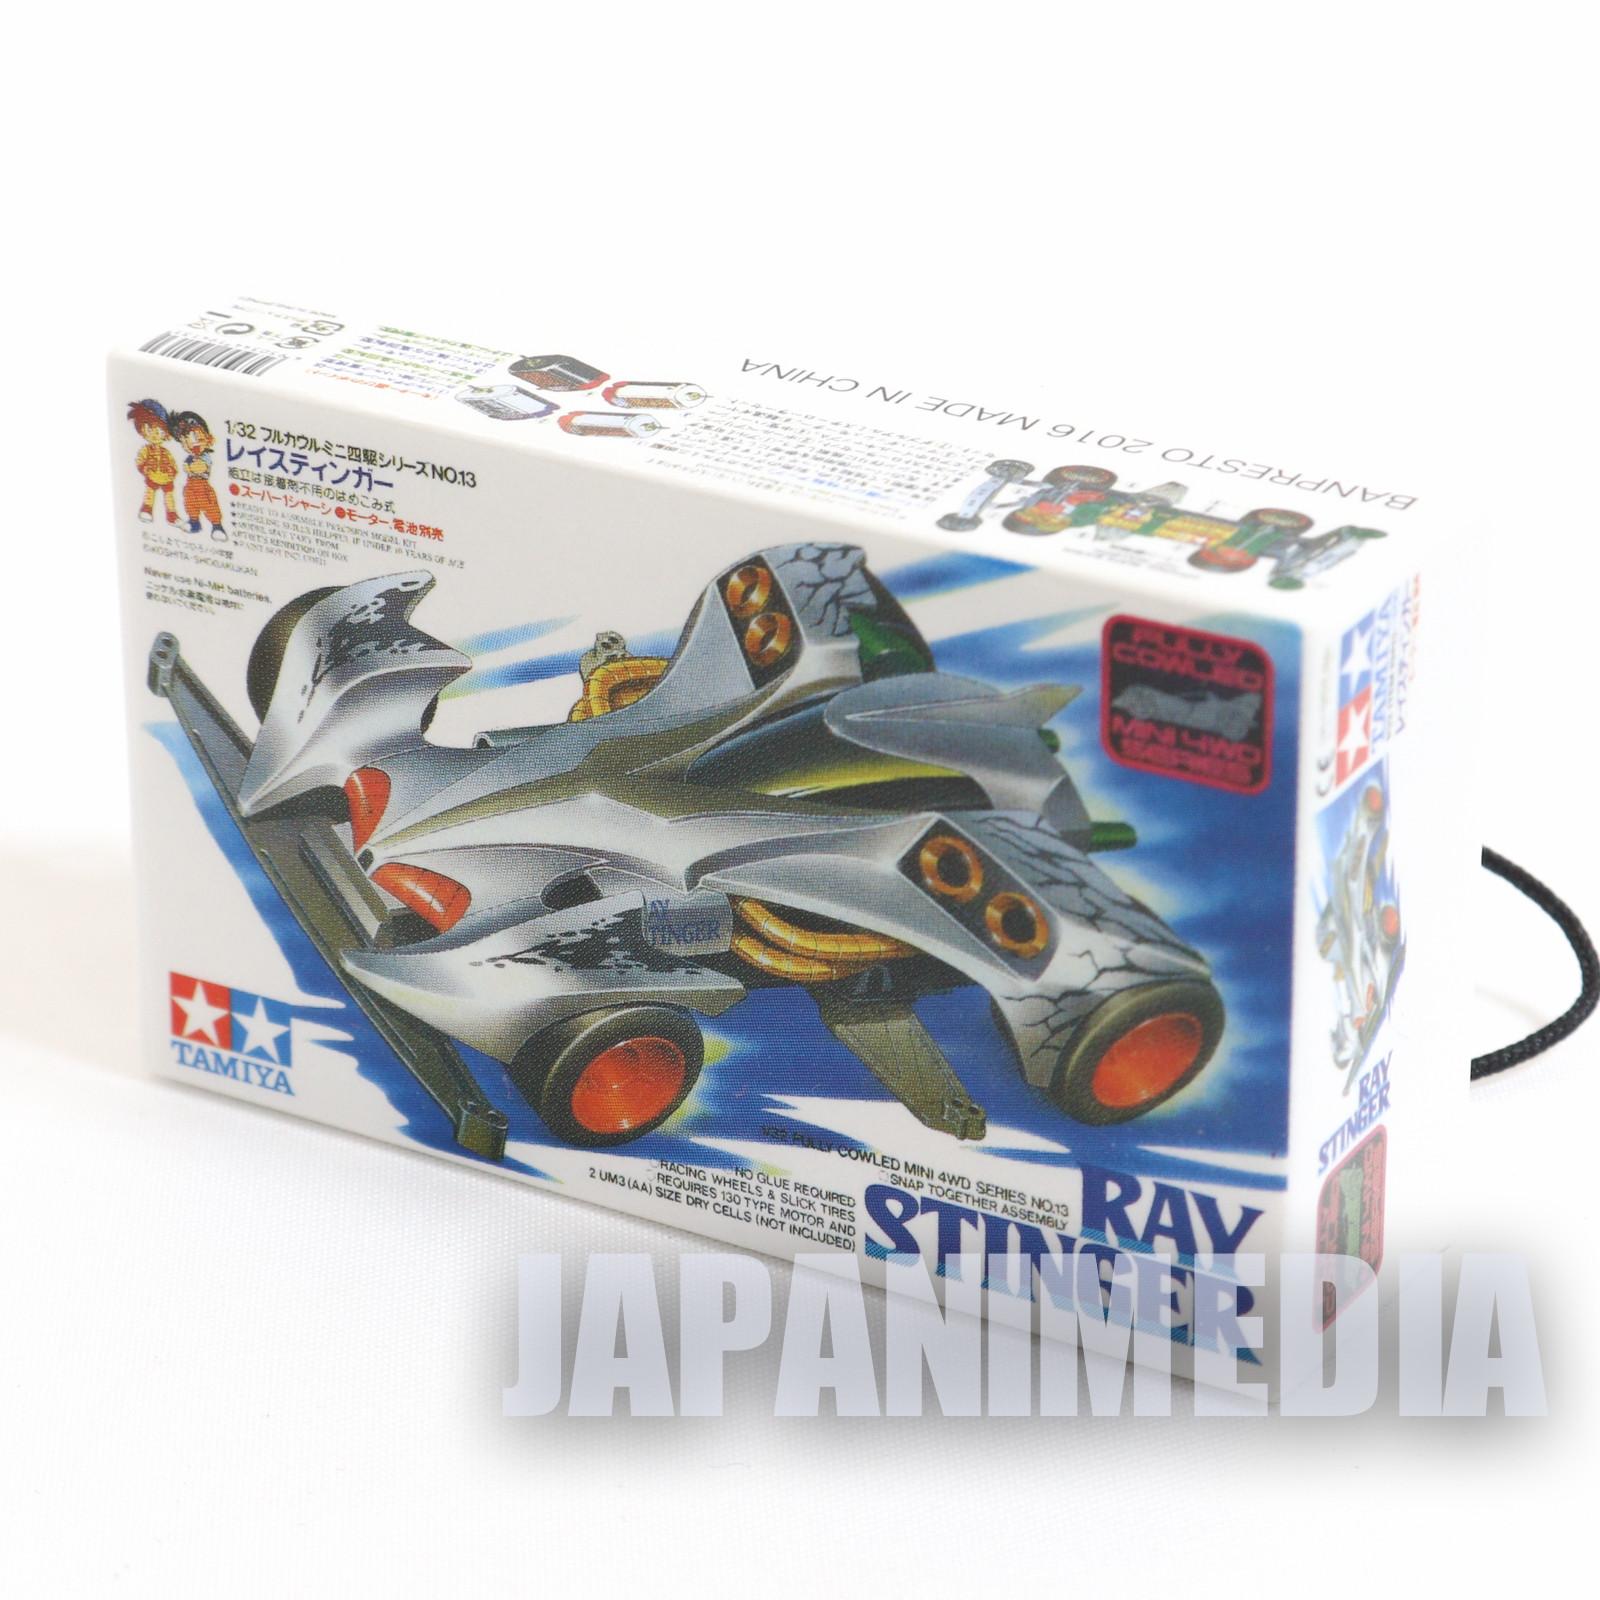 Bakusou Kyoudai Let's & Go!! Small Case Strap Mini 4WD Ray Stinger TAMIYA